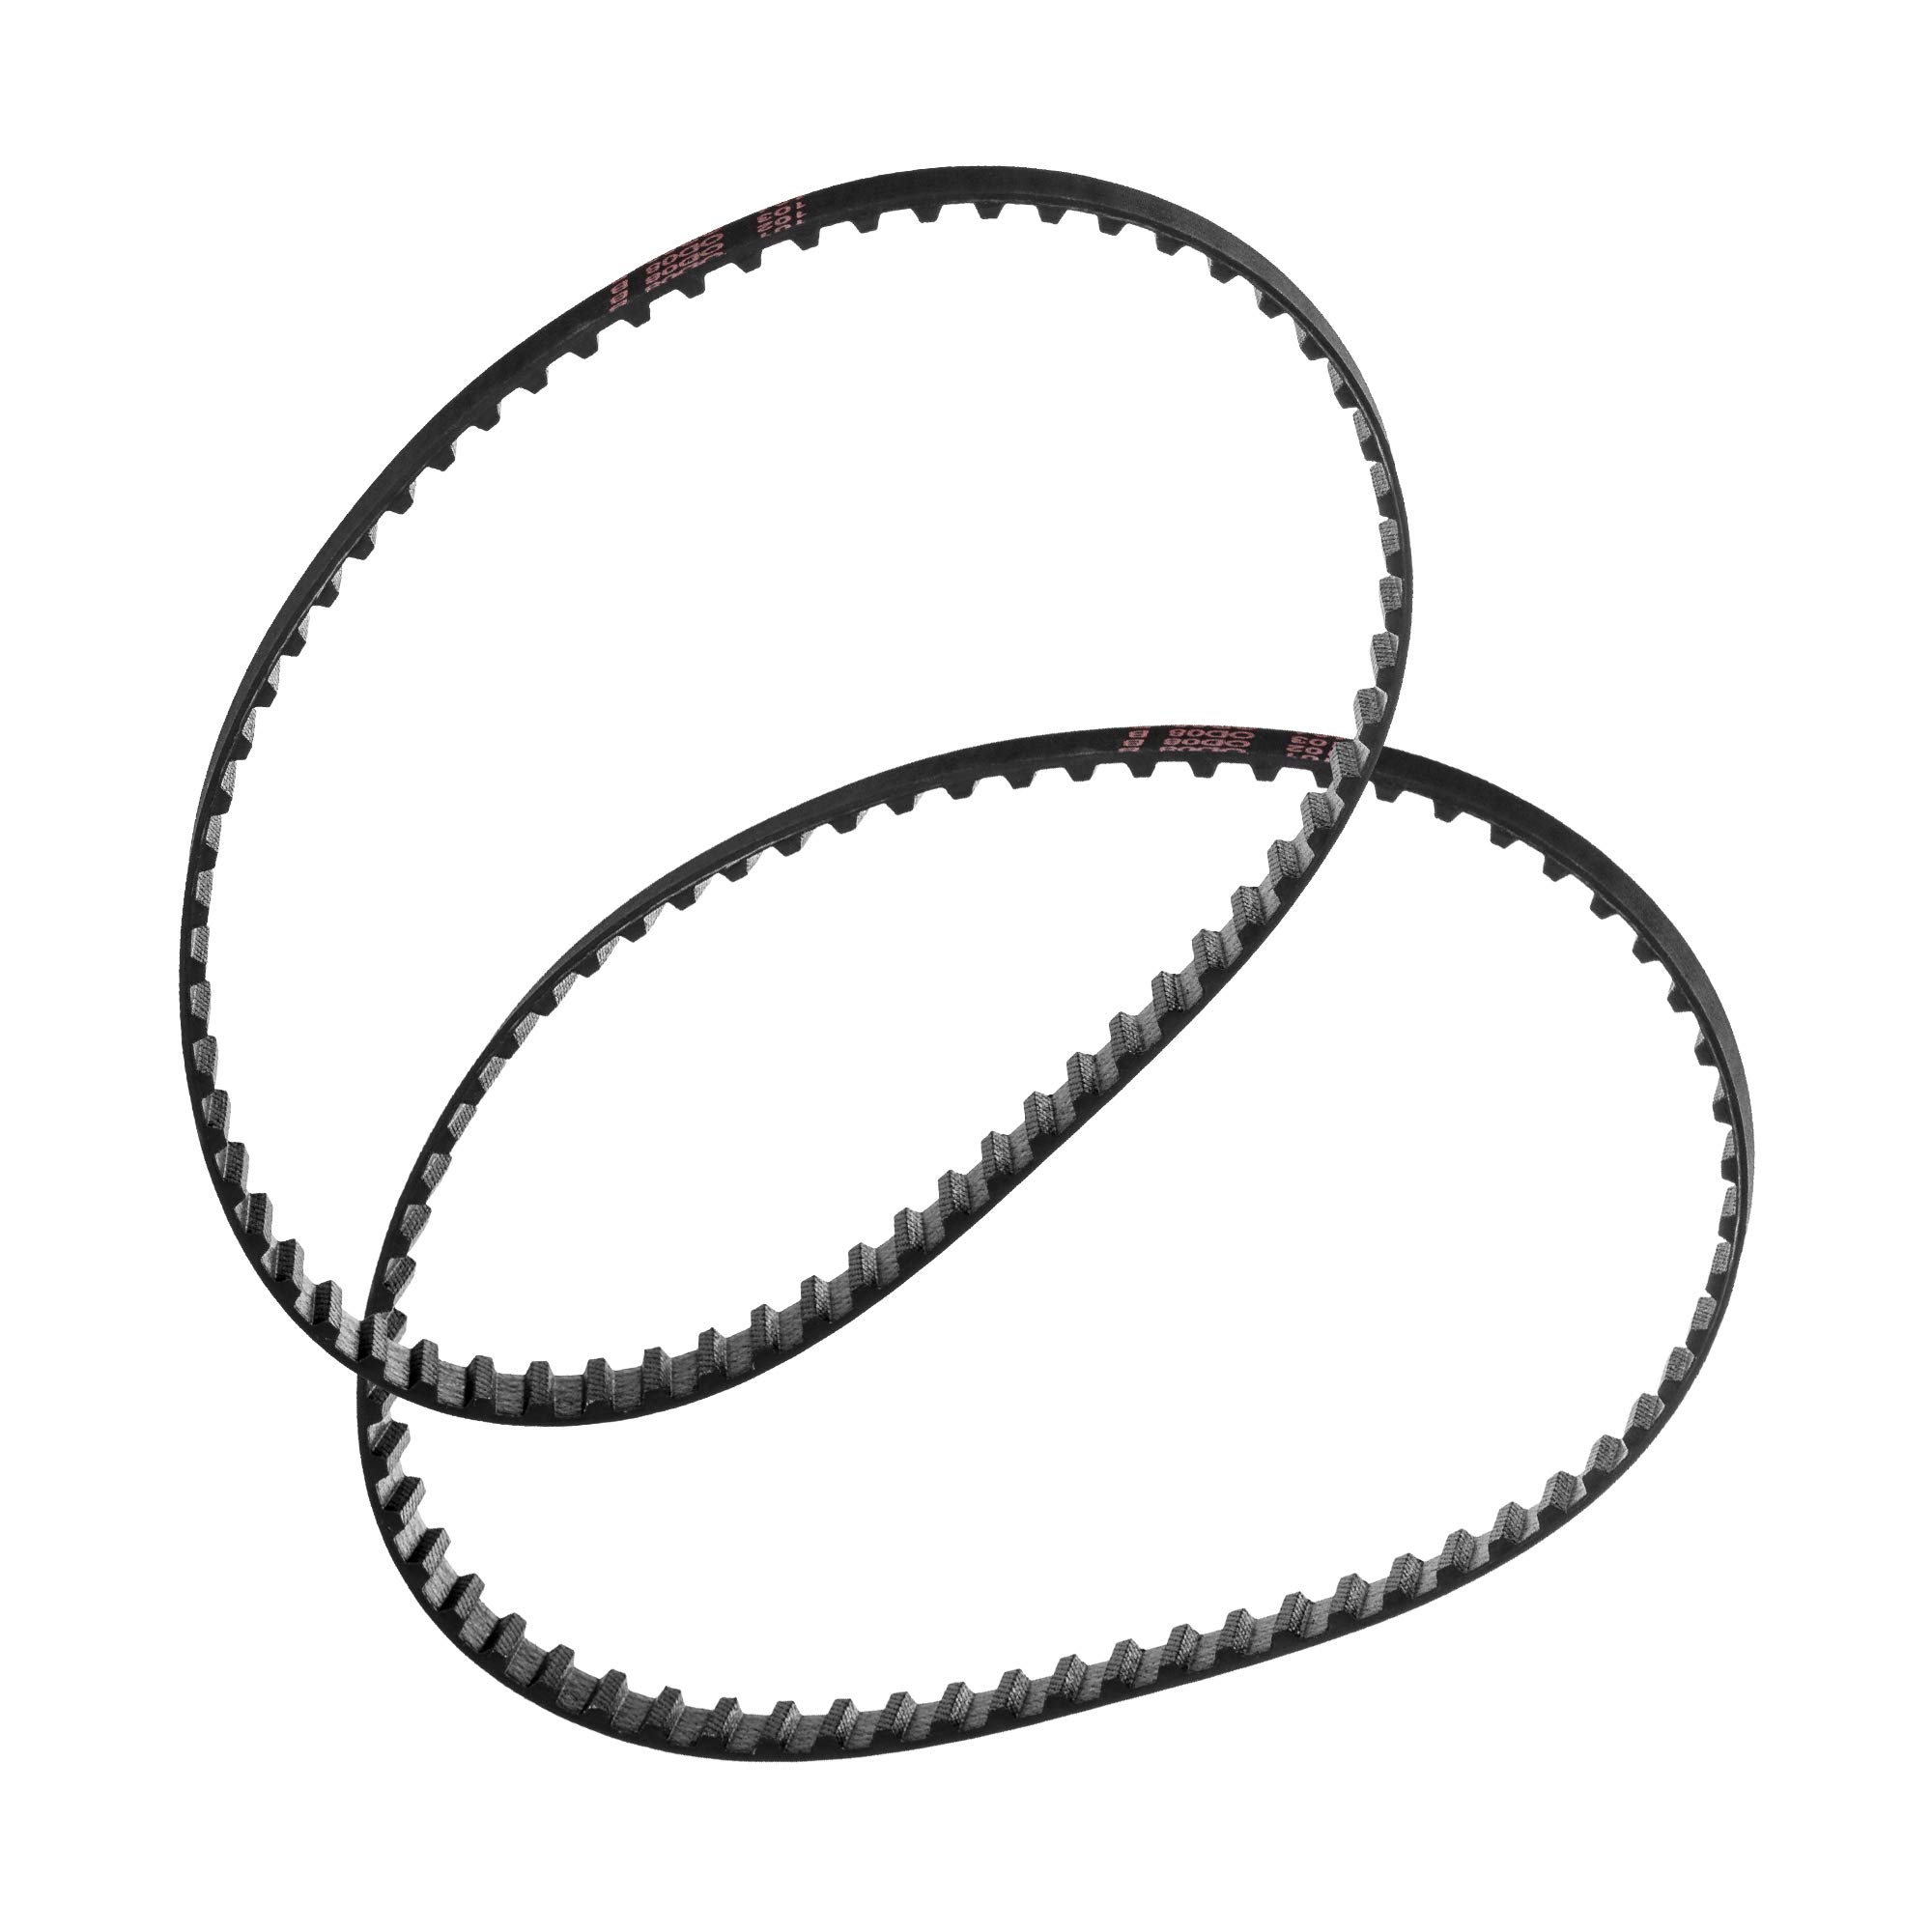 D/&D PowerDrive AC12101 Wayne Lawn Replacement Belt 0.5 Width 70 Length 0.5 Width 70 Length